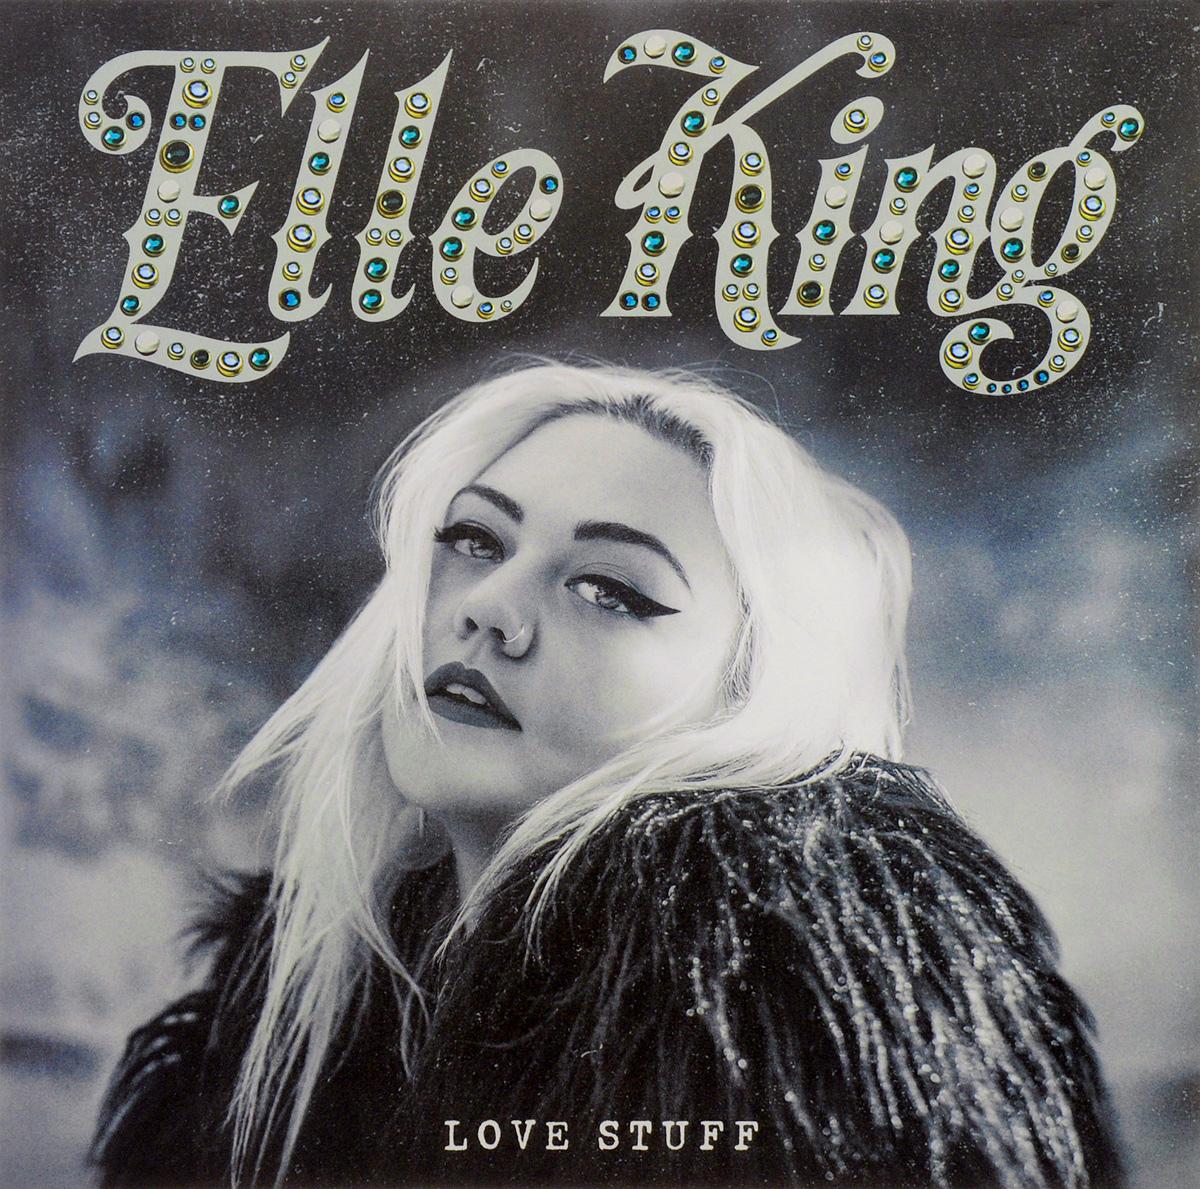 Elle King Elle King. Love Stuff (LP) duane swierczynski ken lashley cable king size 1